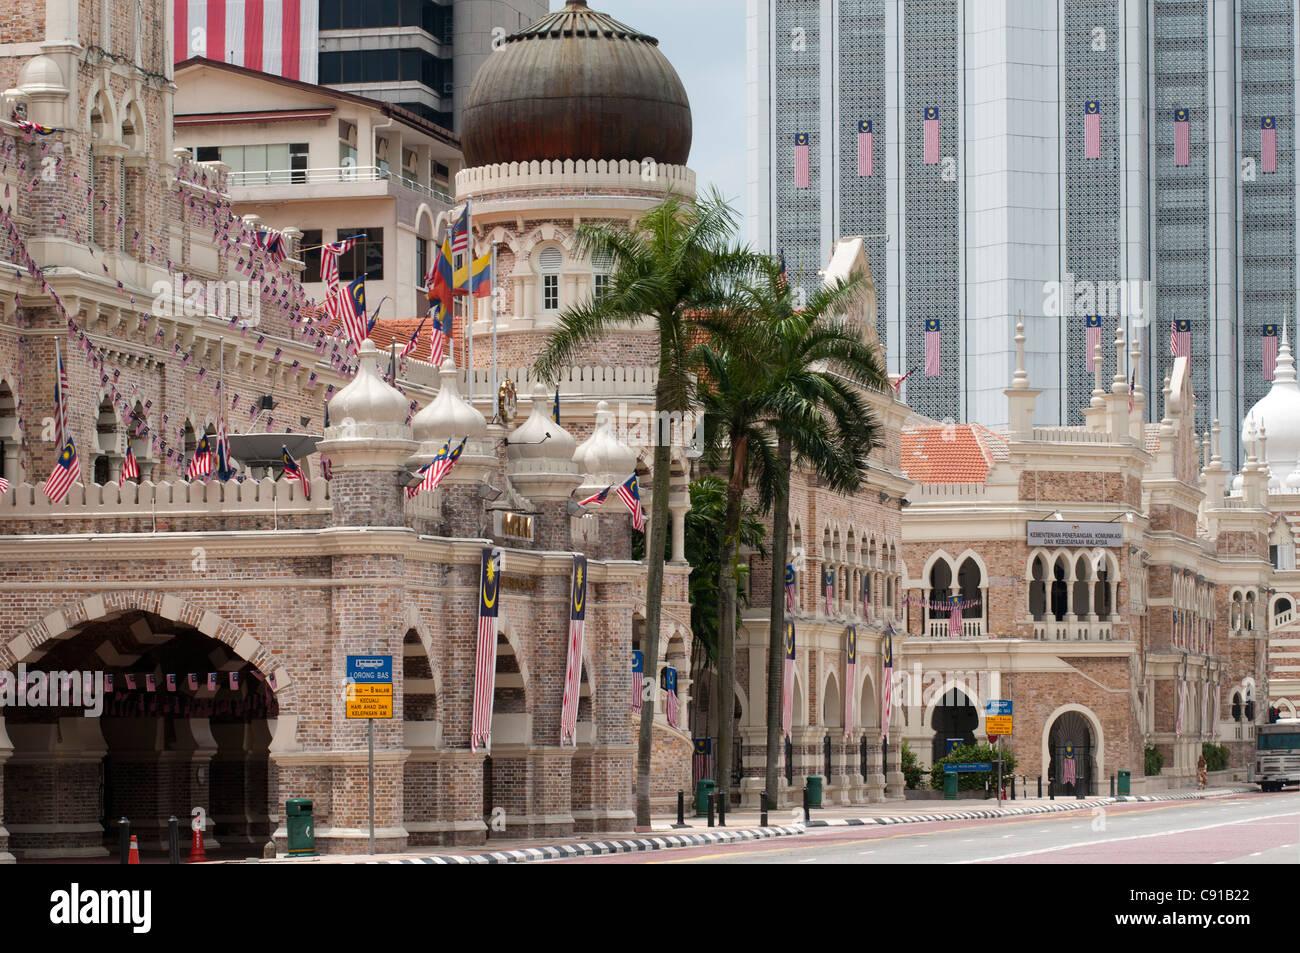 View from Merdeka Square to Sultan Abdul Samad Building, Kuala Lumpur, Malaysia, Asia - Stock Image